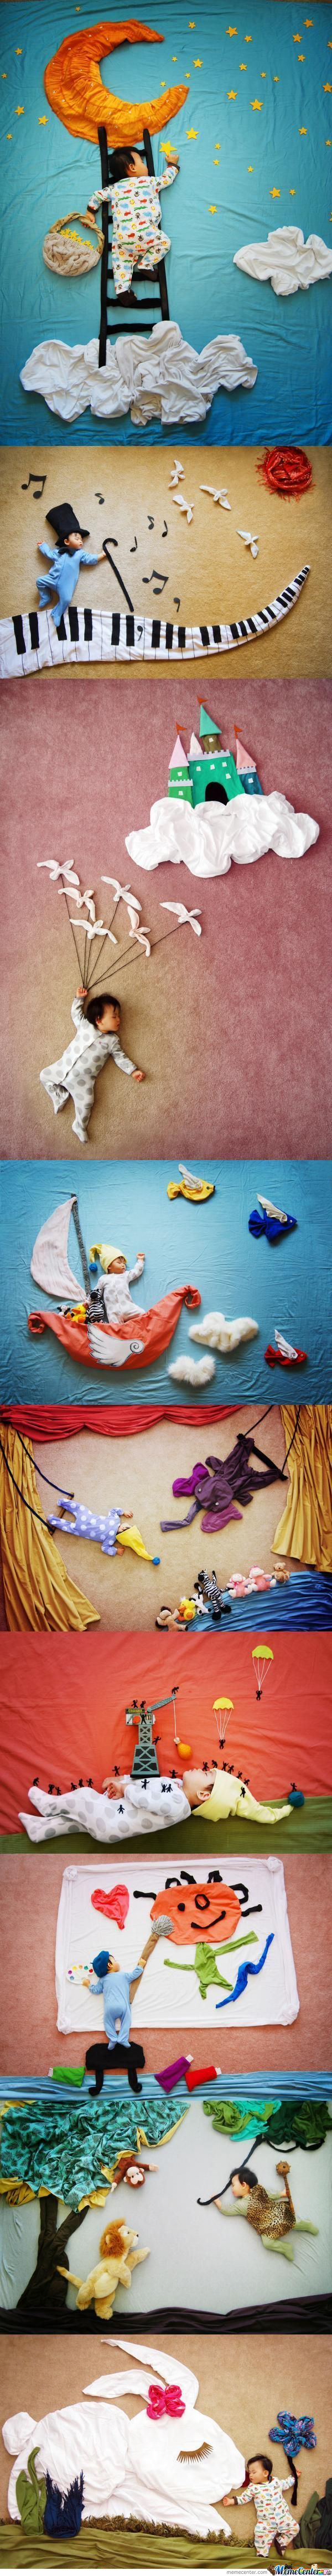 Kids' Dreams #1